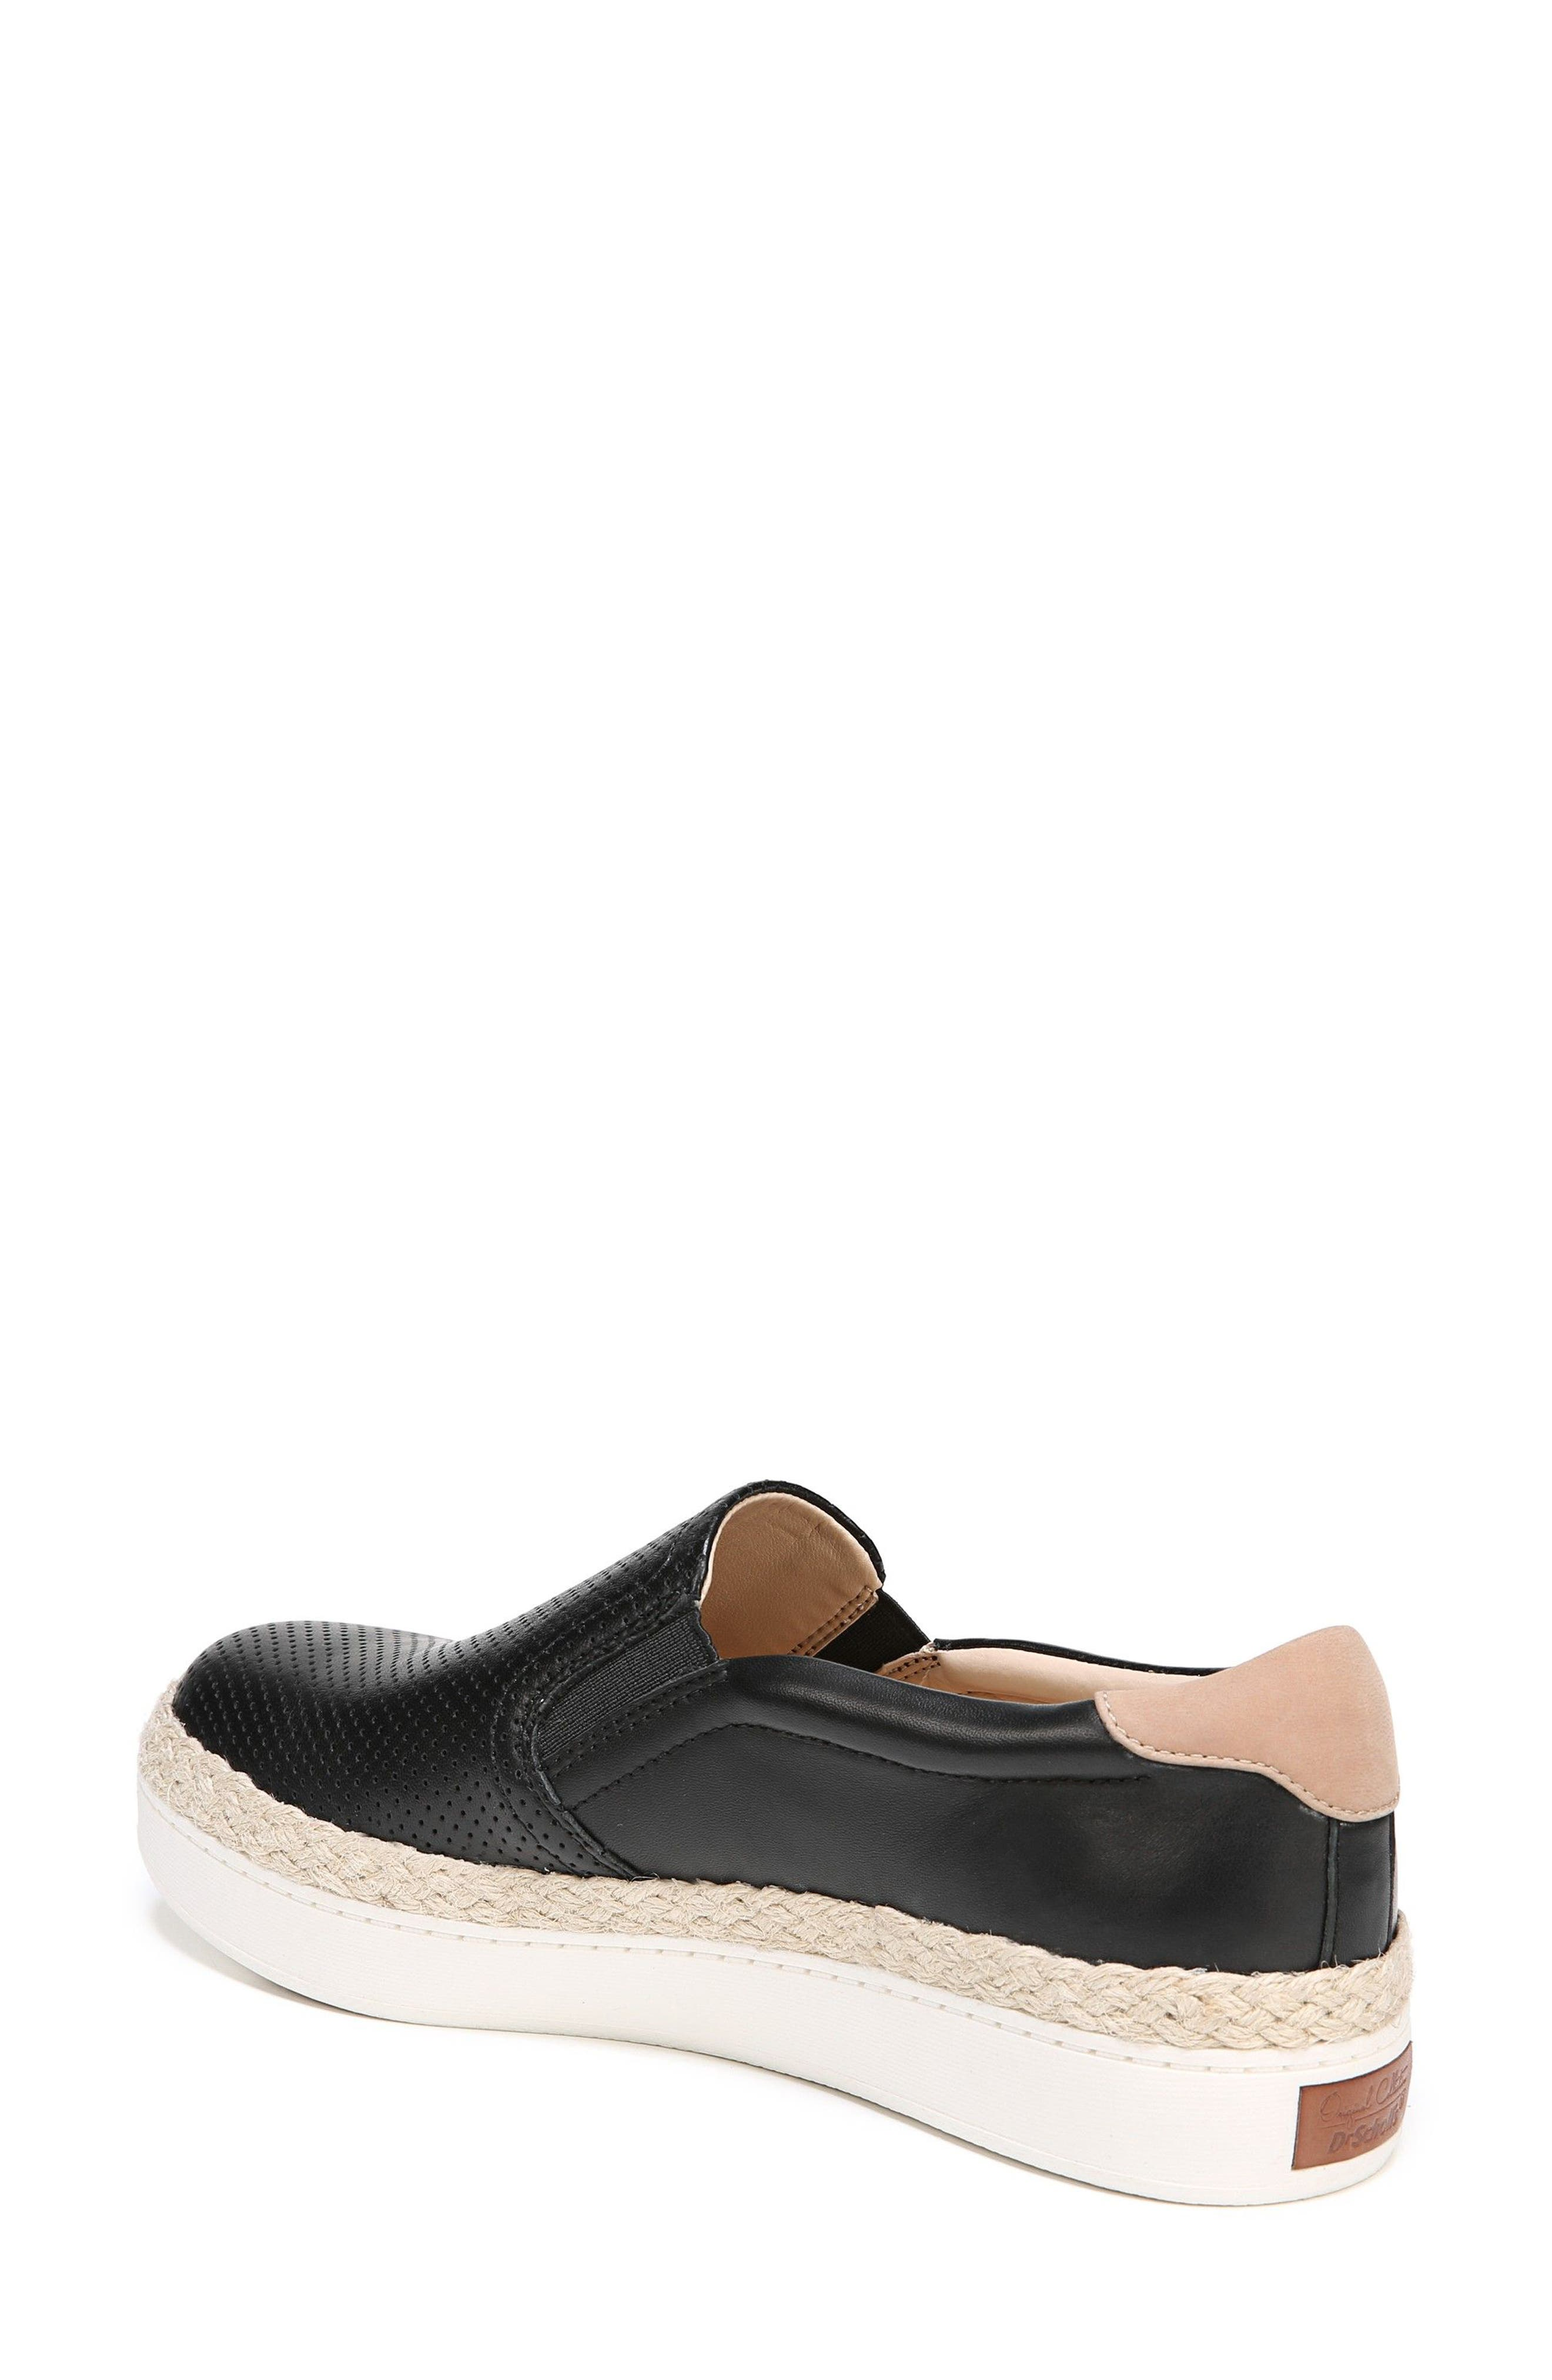 DR. SCHOLL'S, Scout Slip-On Sneaker, Alternate thumbnail 2, color, BLACK LEATHER